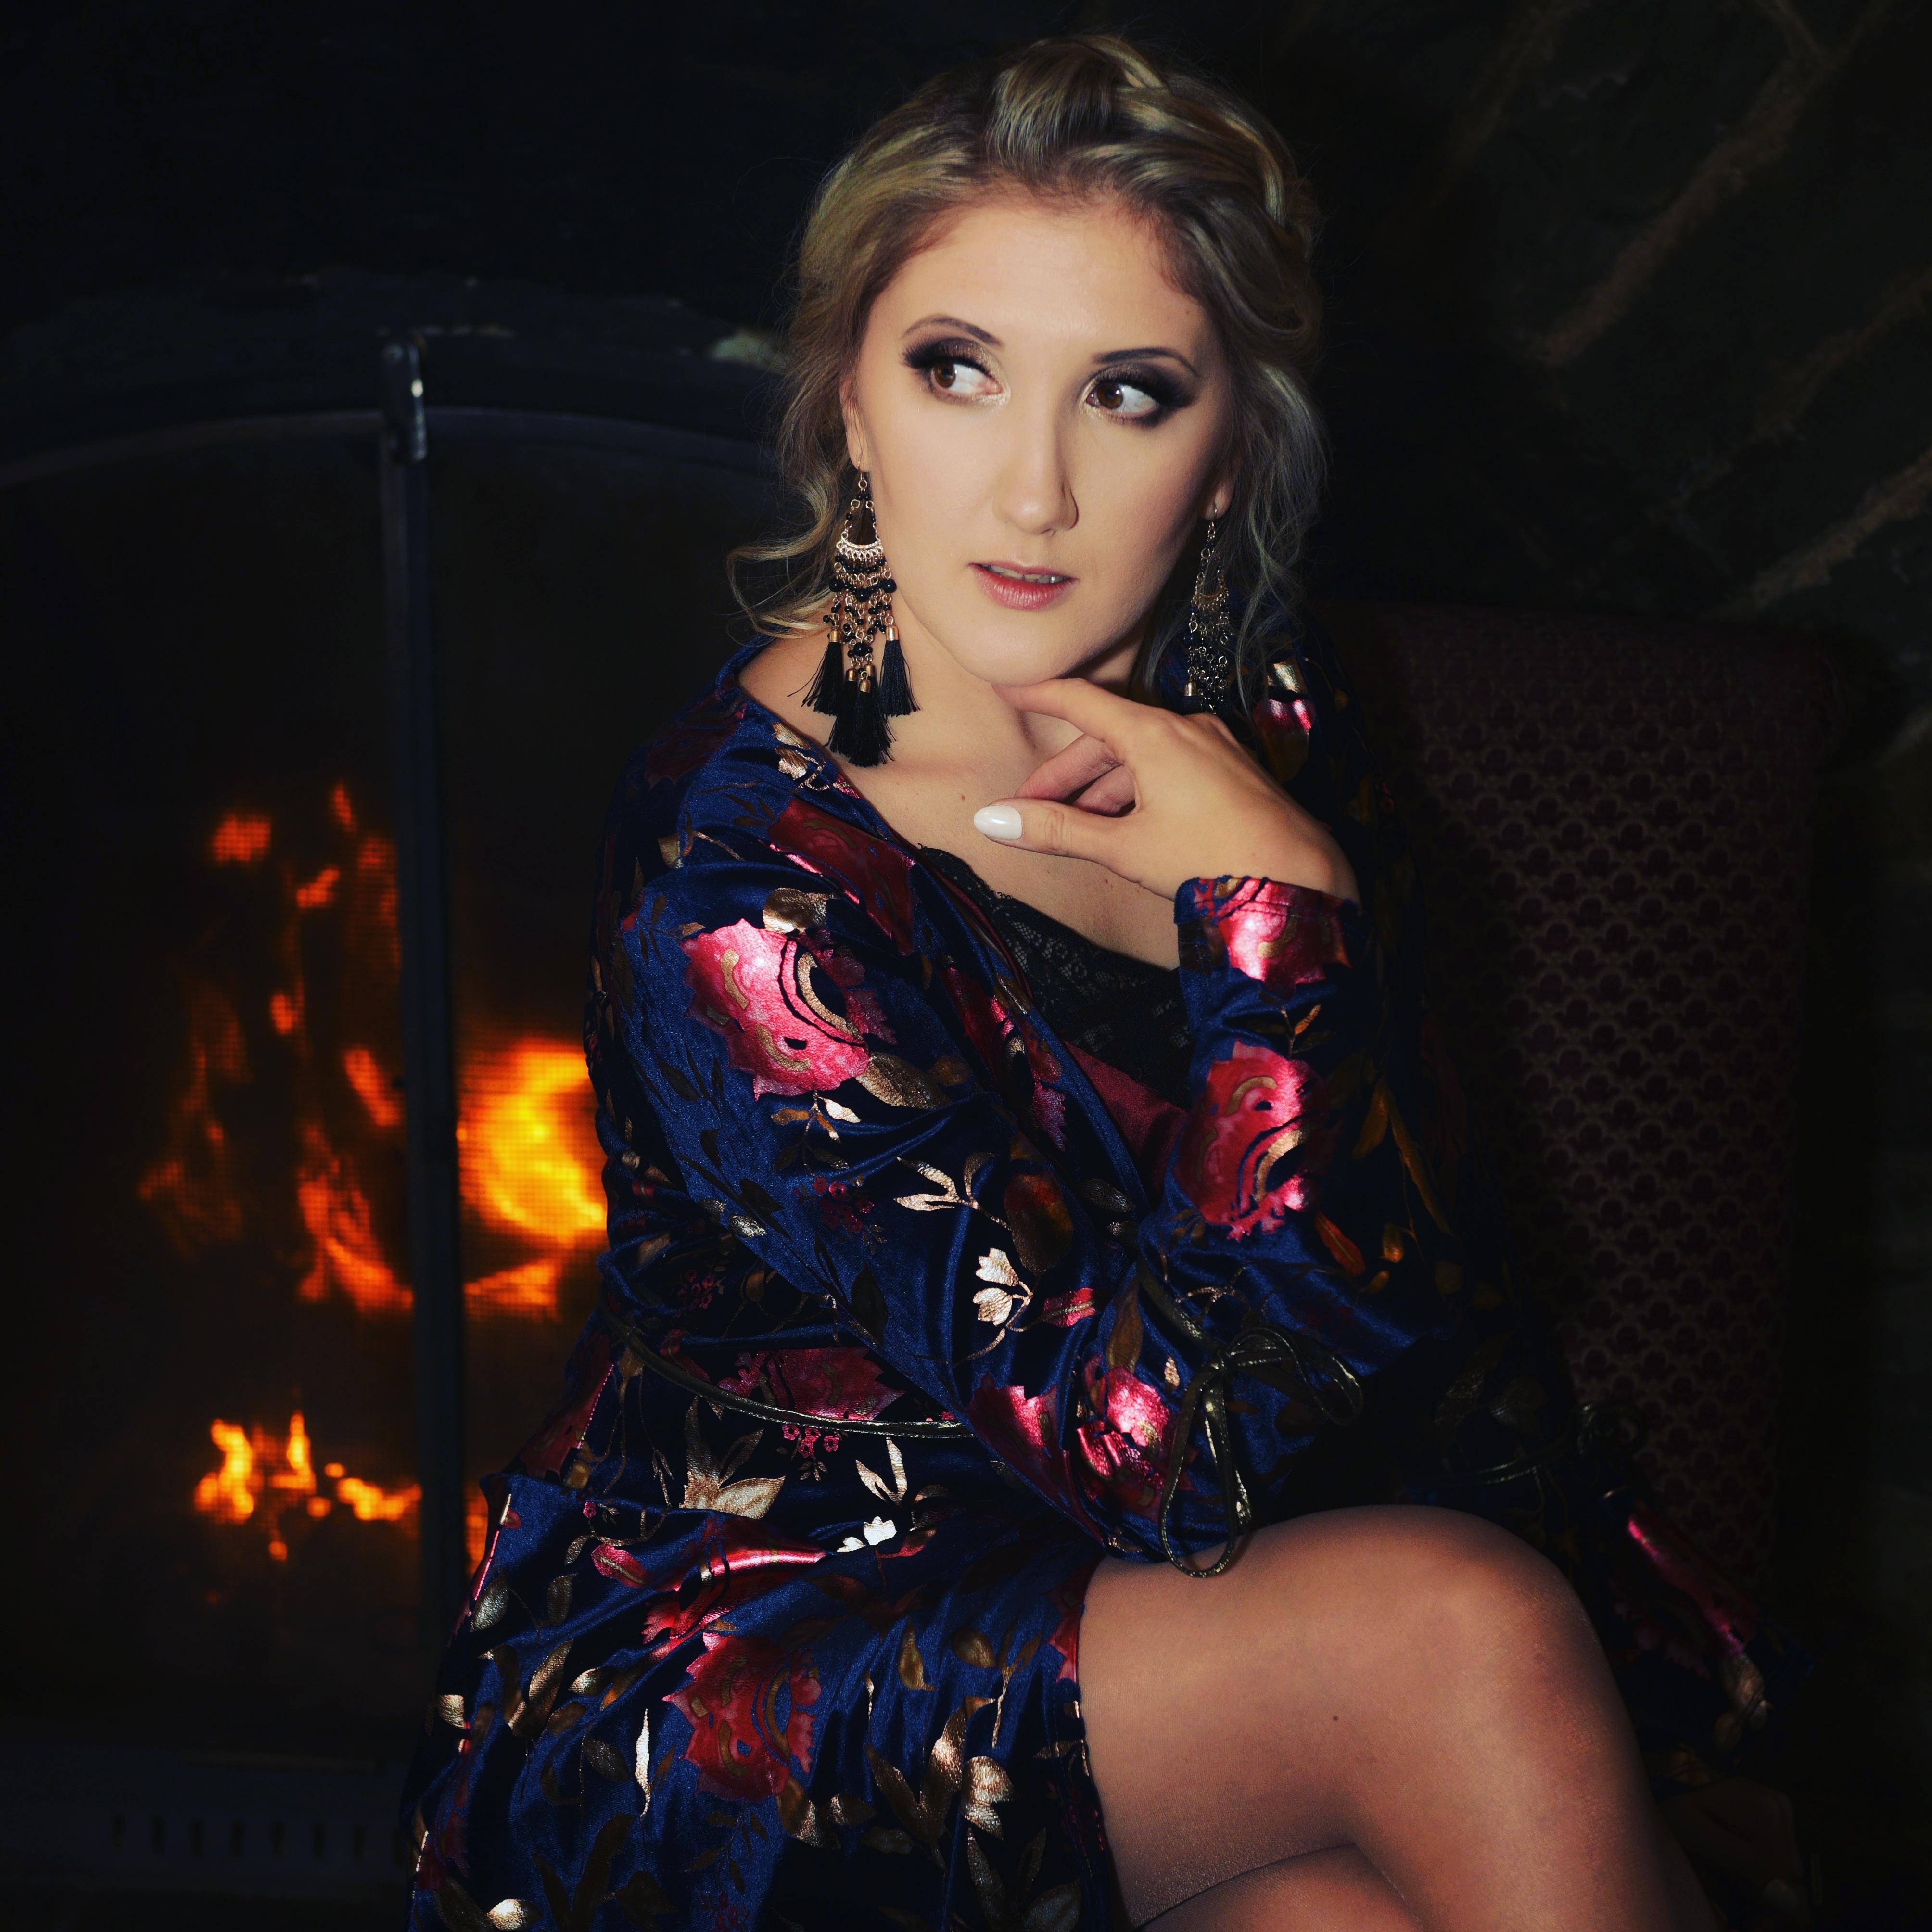 Anna Oleksiievych